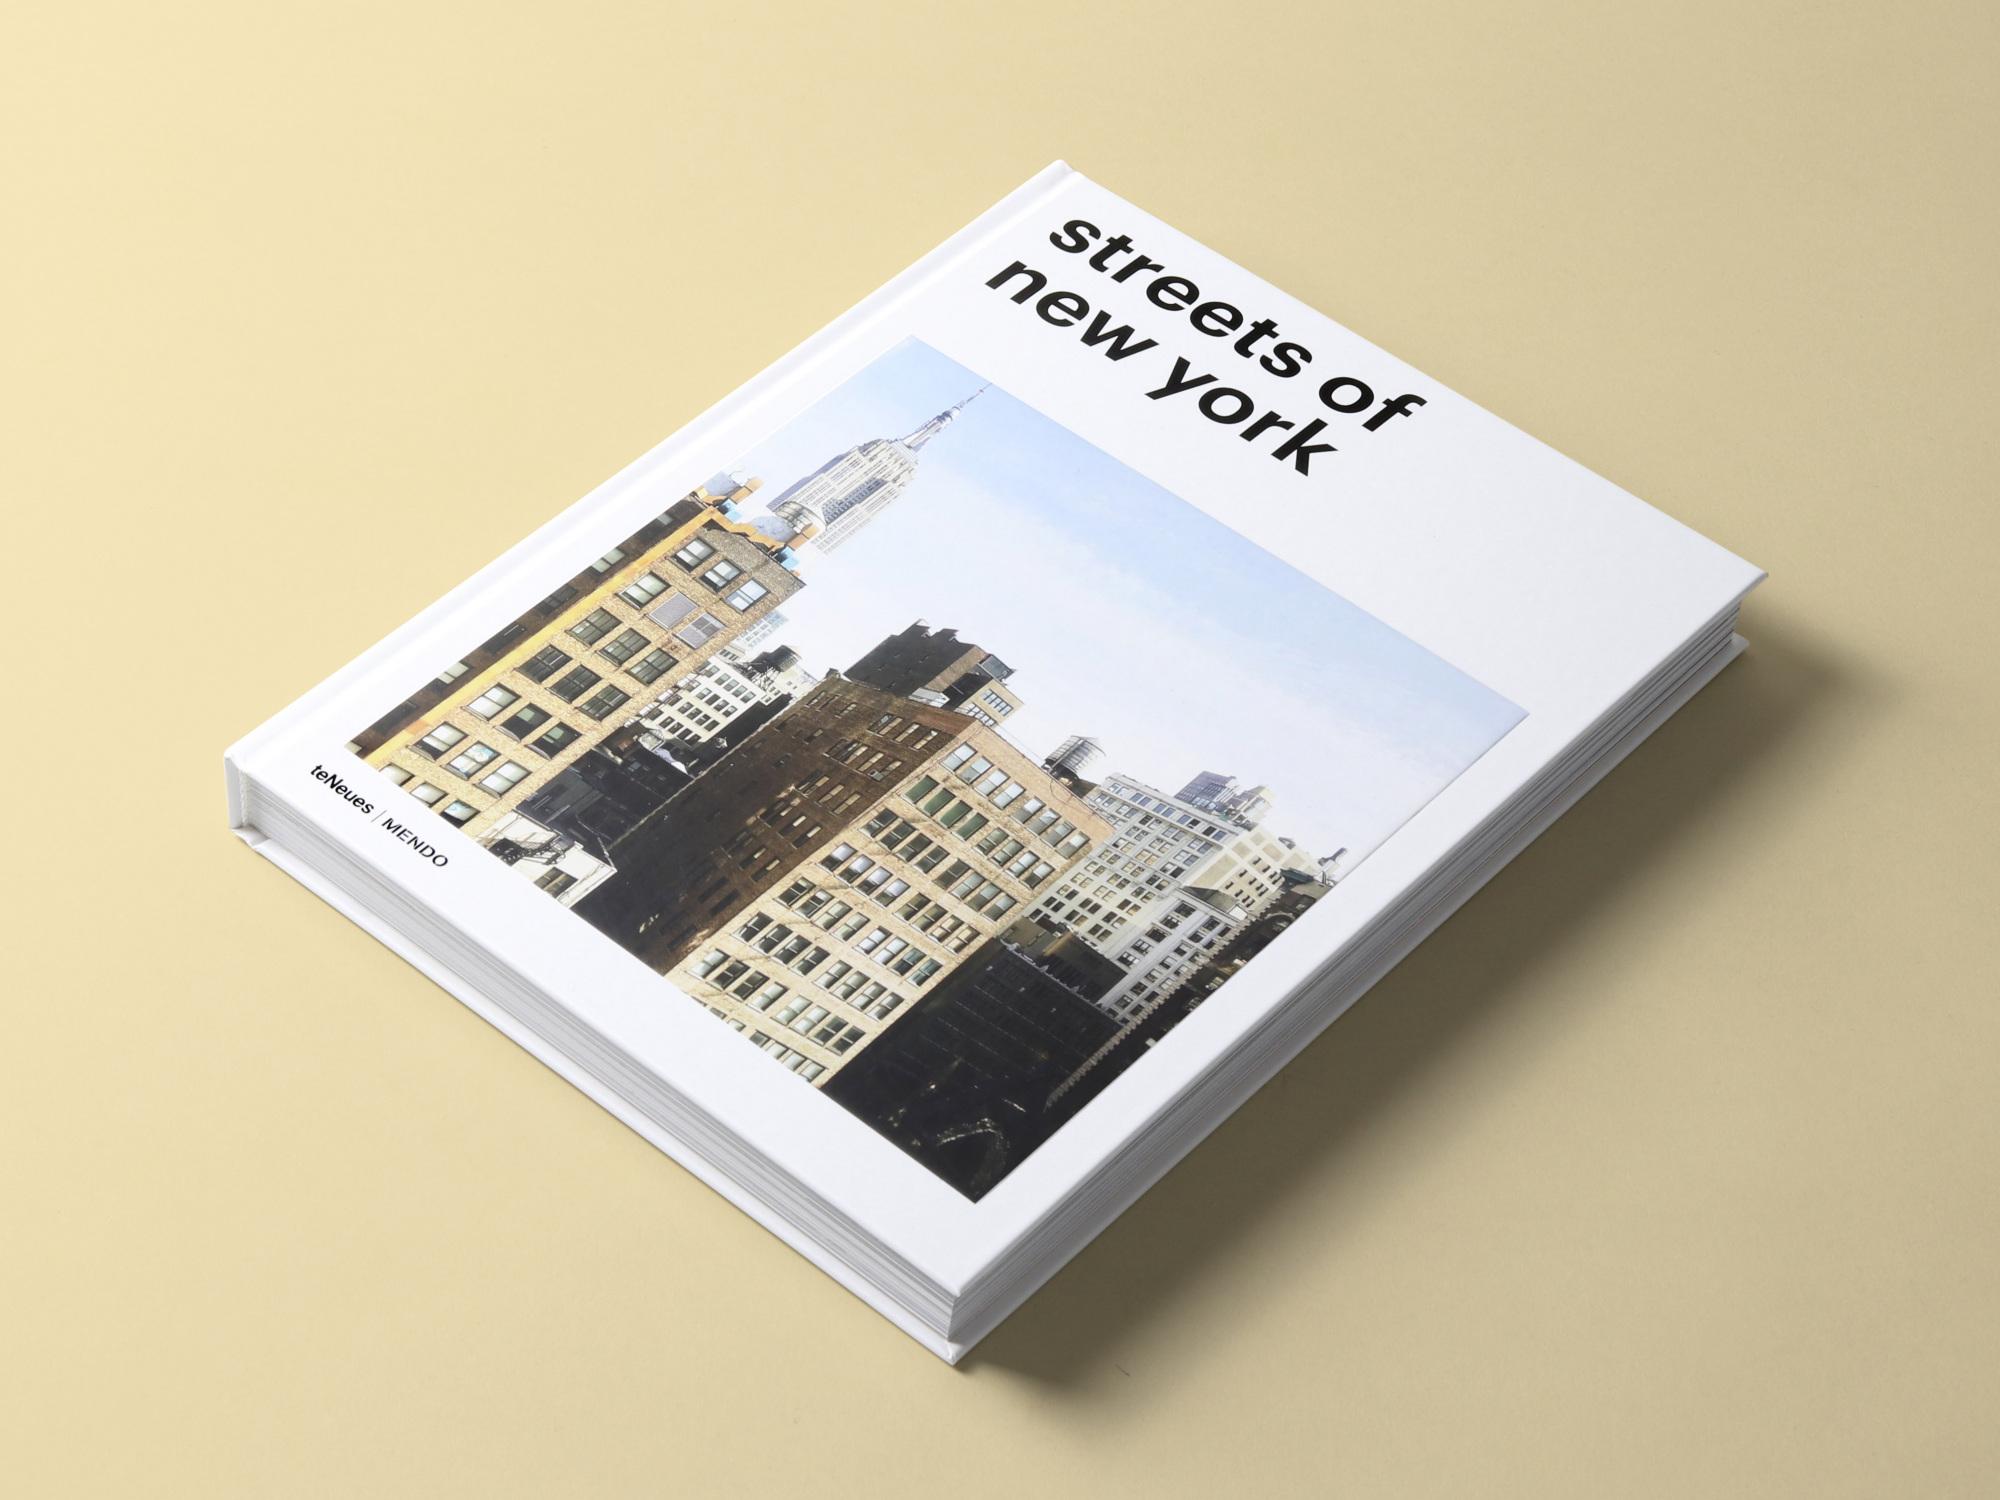 mendo-book-streets-of-new-york-03-2000x1500-c-default.jpg